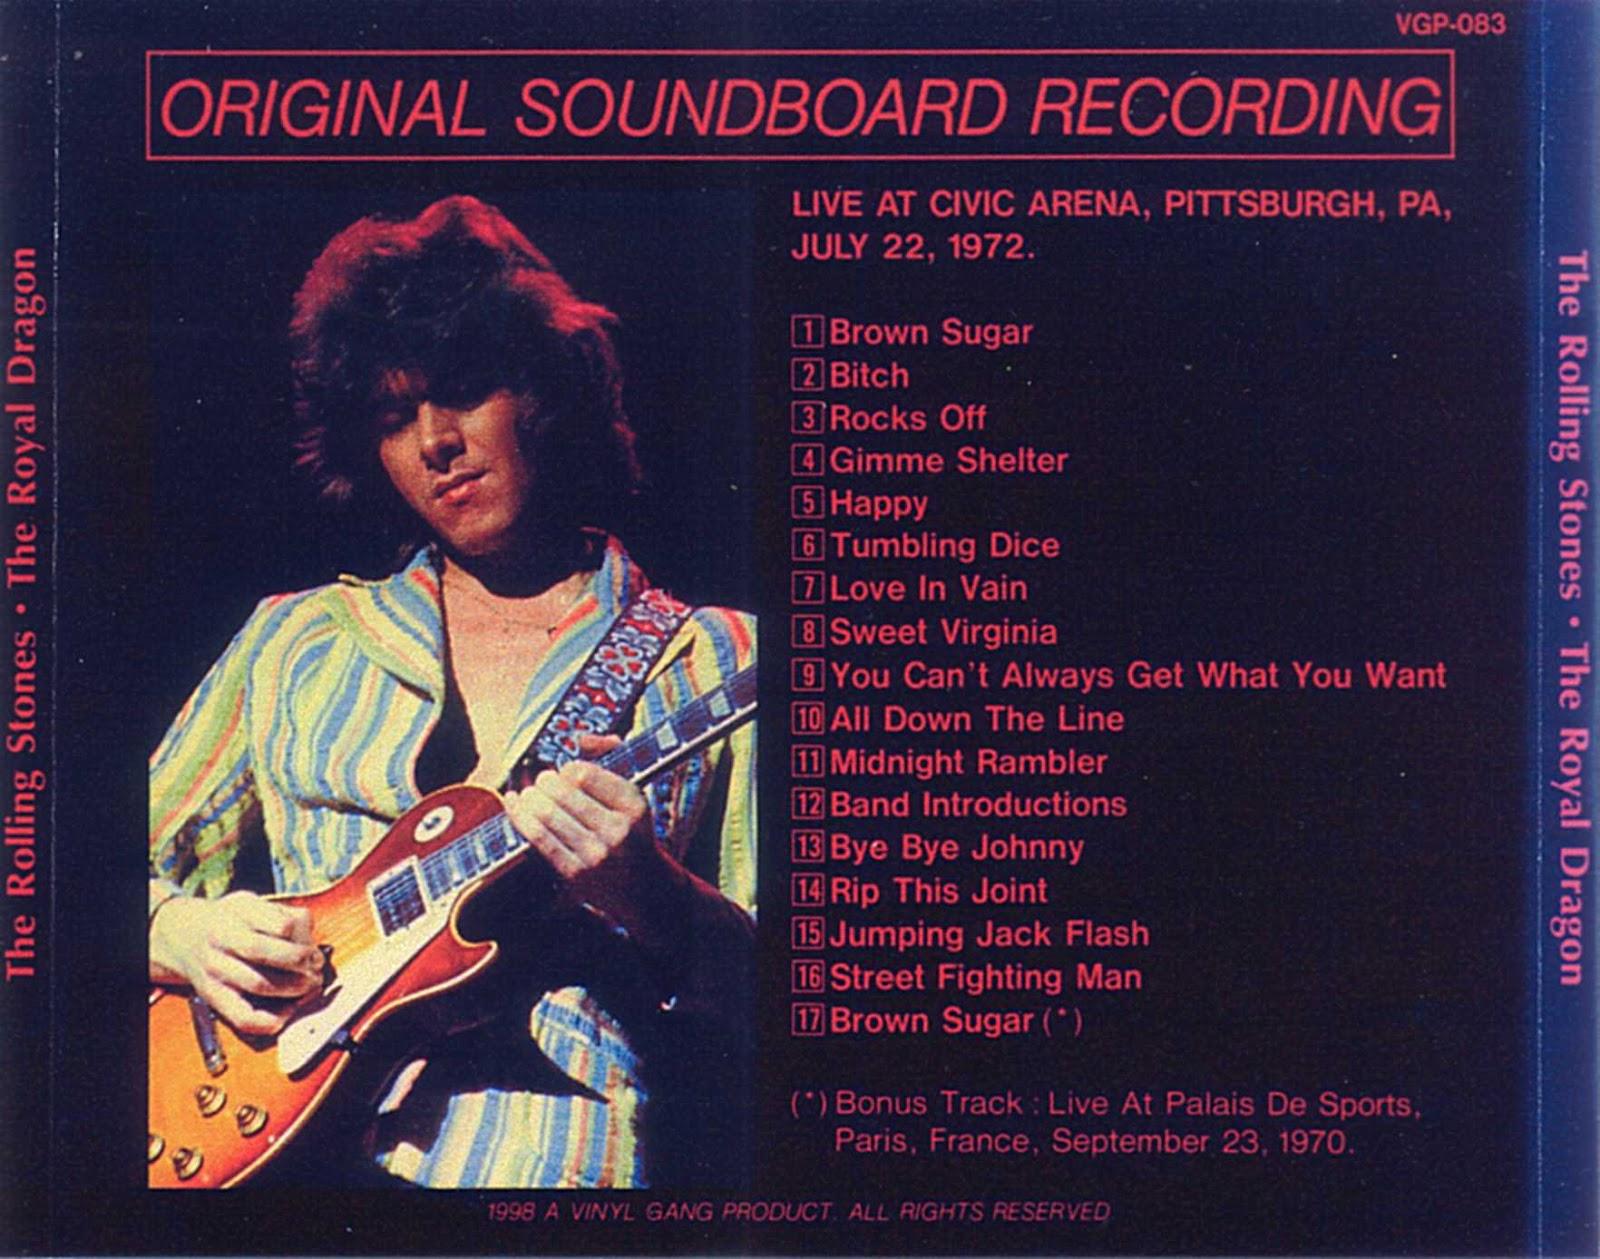 Plumdusty s page pink floyd 1975 06 12 spectrum theater philadelphia -  Soundboard Flac